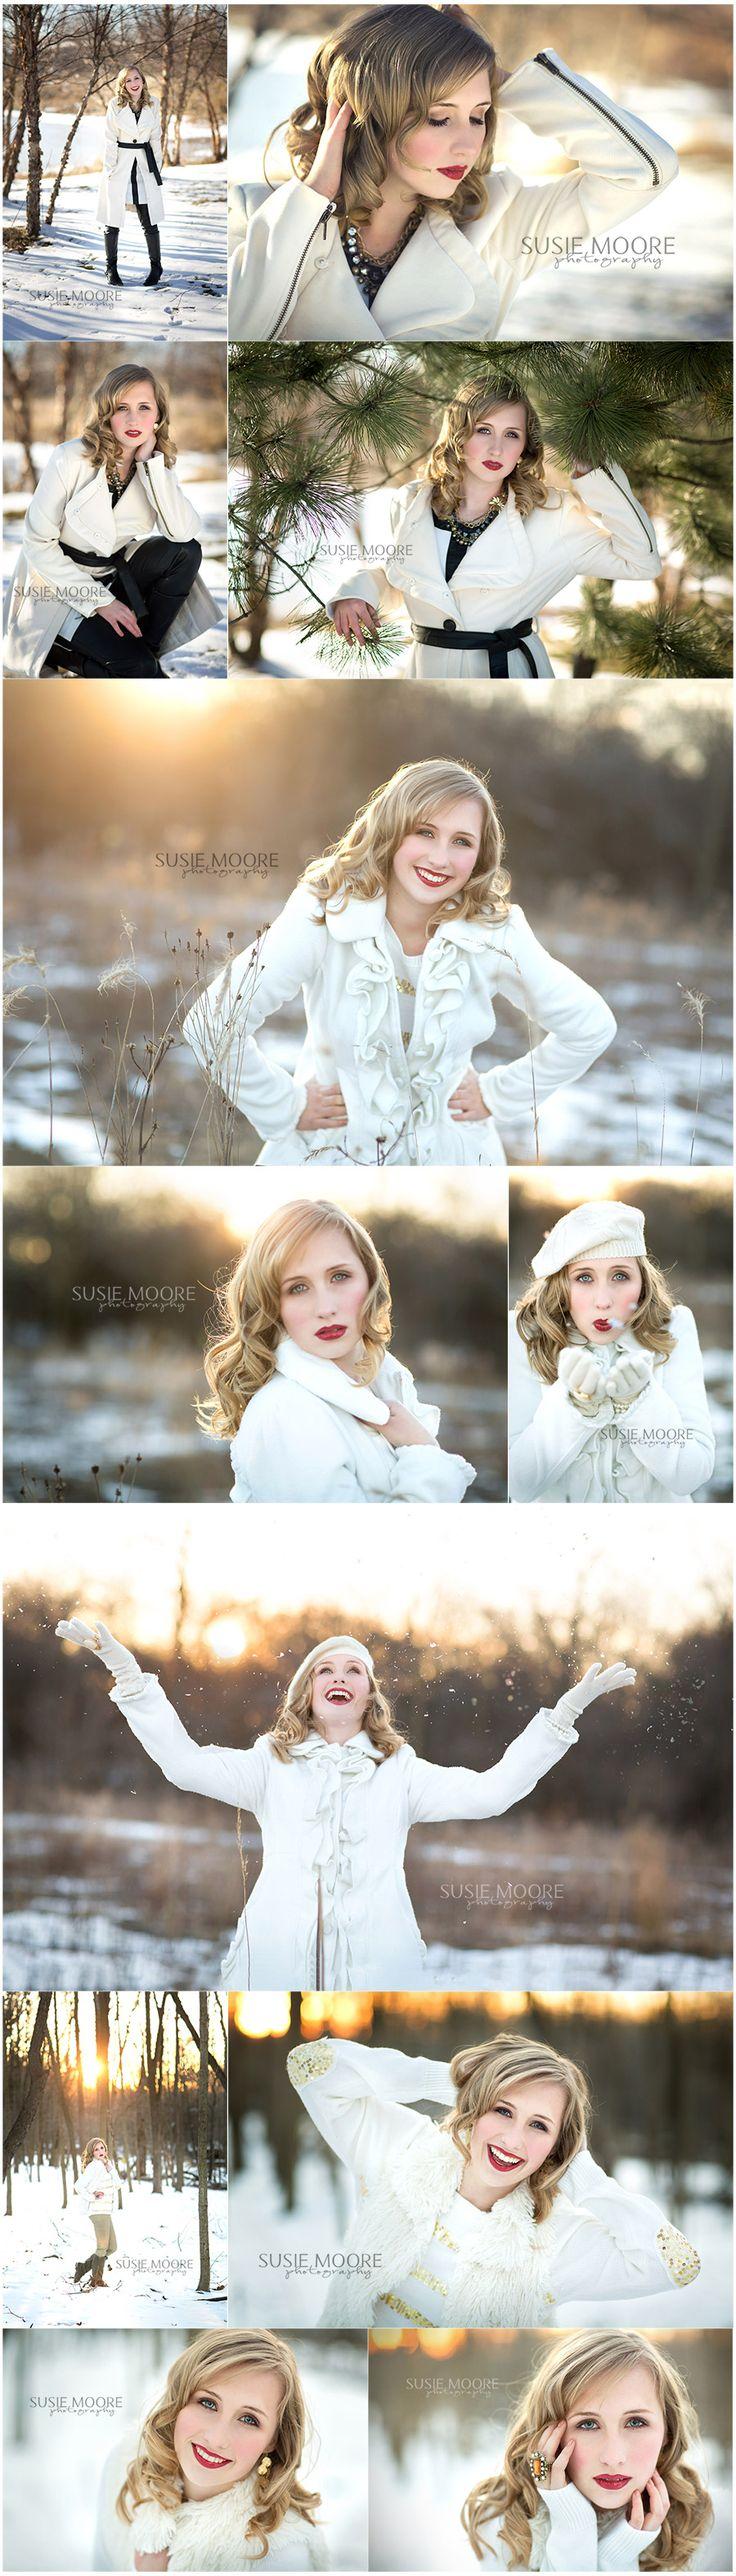 Lauren | Carl Sandburg High School | Class of 2013 | Chicago Senior Photographer | Indianapolis Senior Photographer